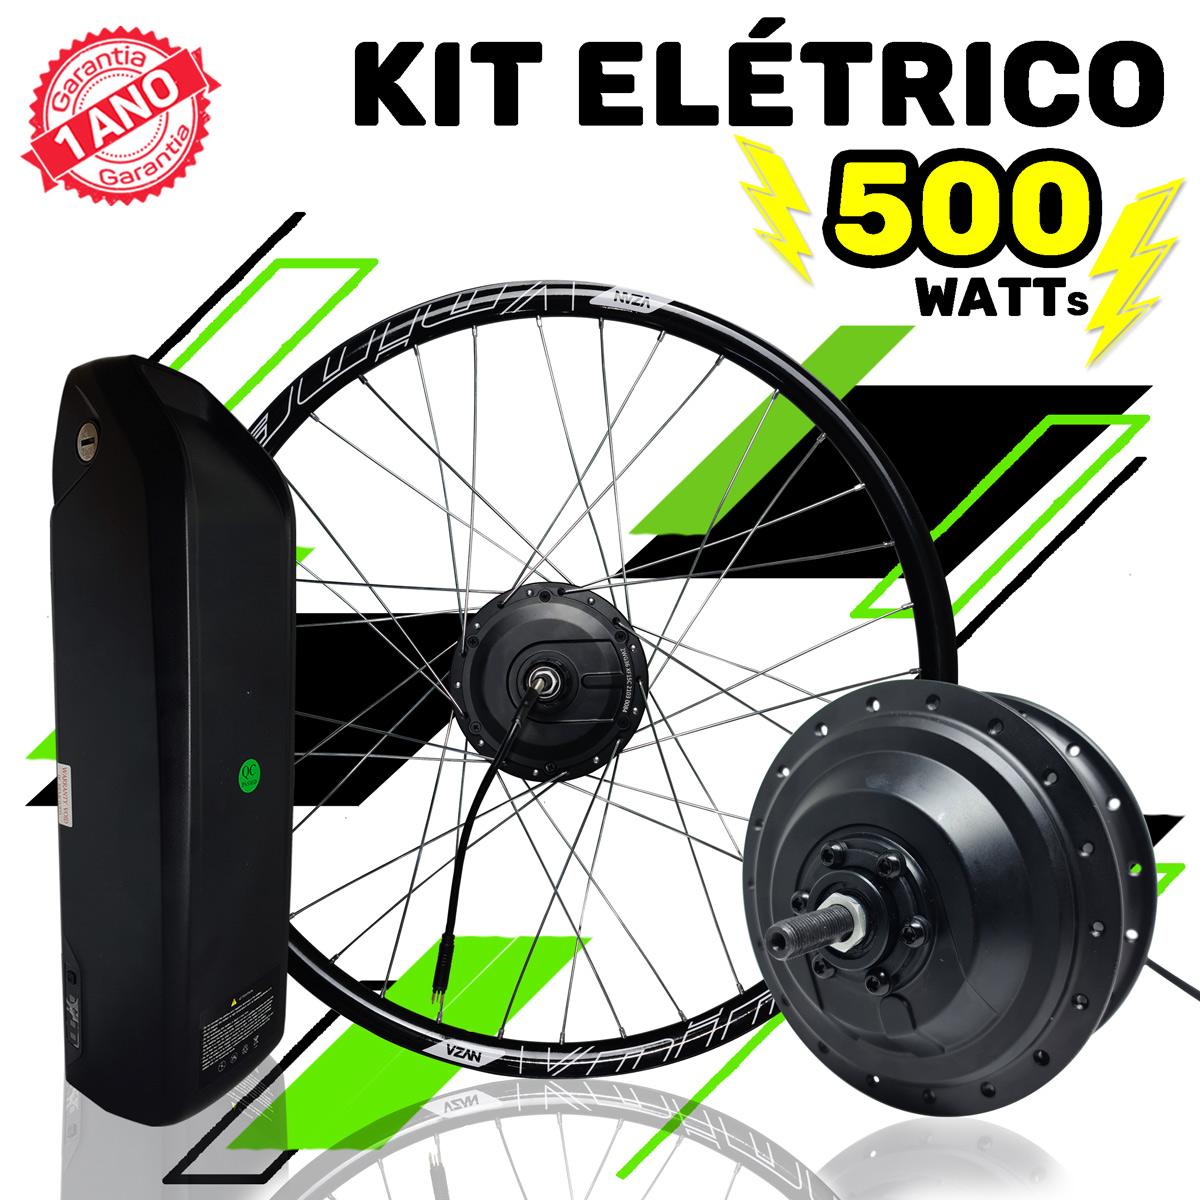 Kit Elétrico para Bicicleta - TecBike - 500 Watts 36V - Aro 29